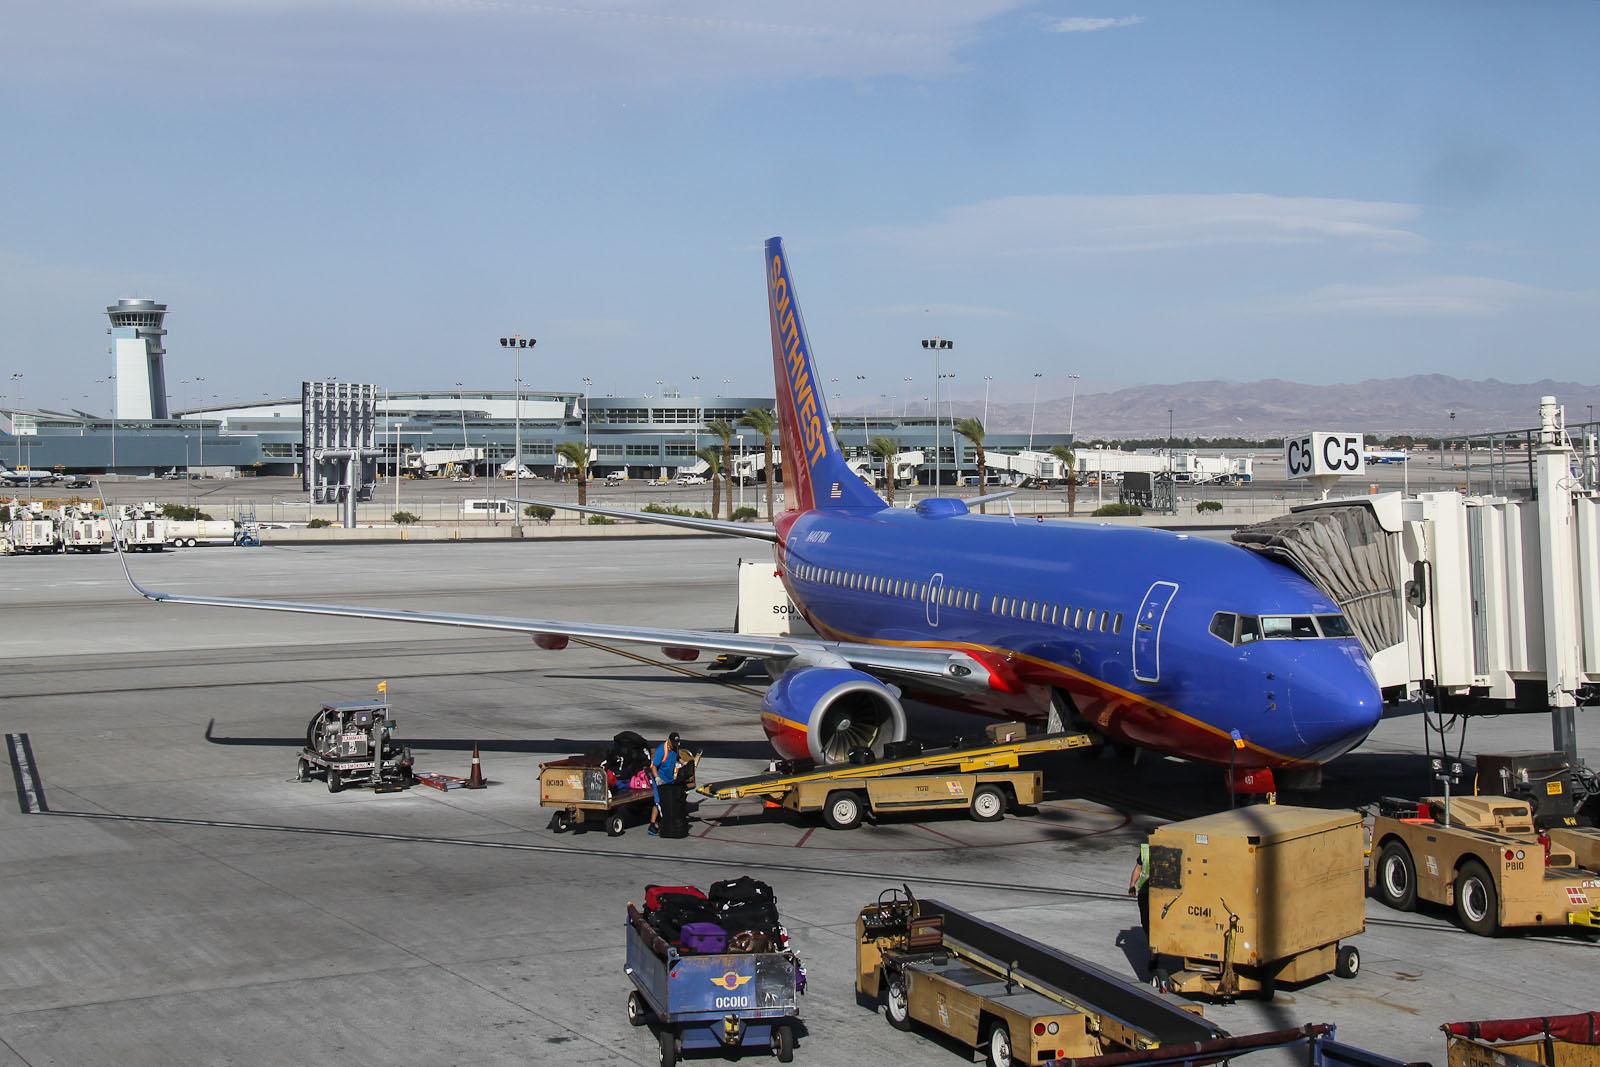 Boeing 737-700 N487WN авиакомпании Southwest в аэропорту Лас-Вегаса